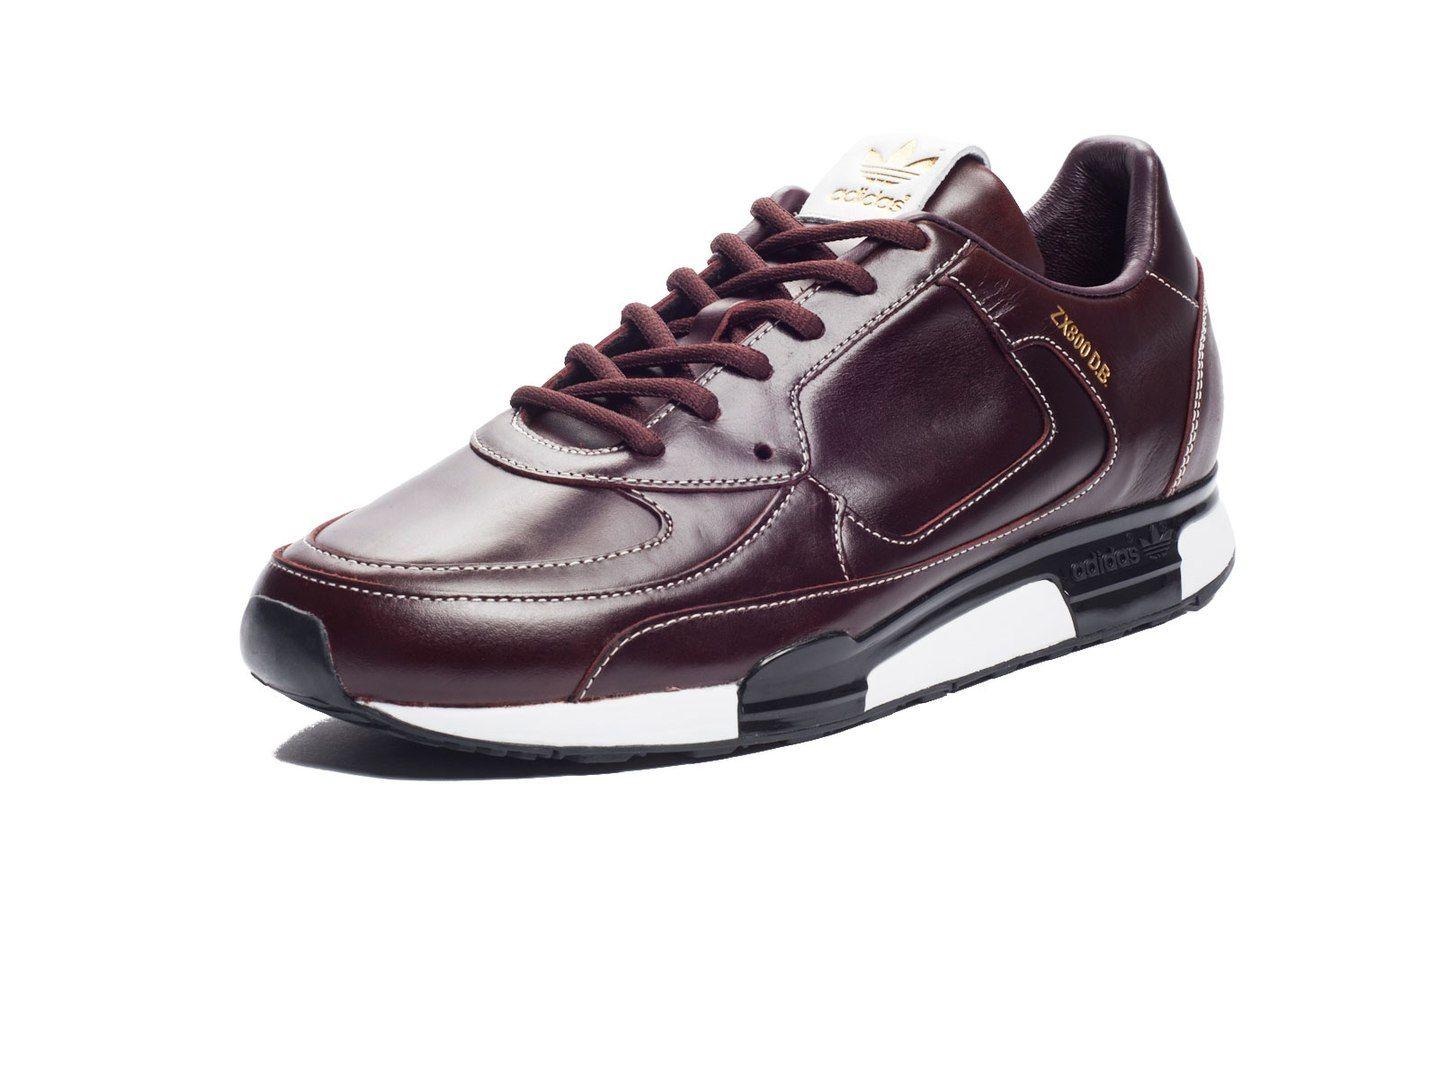 adidas obyo david beckham by james bond zx 800 burgundy